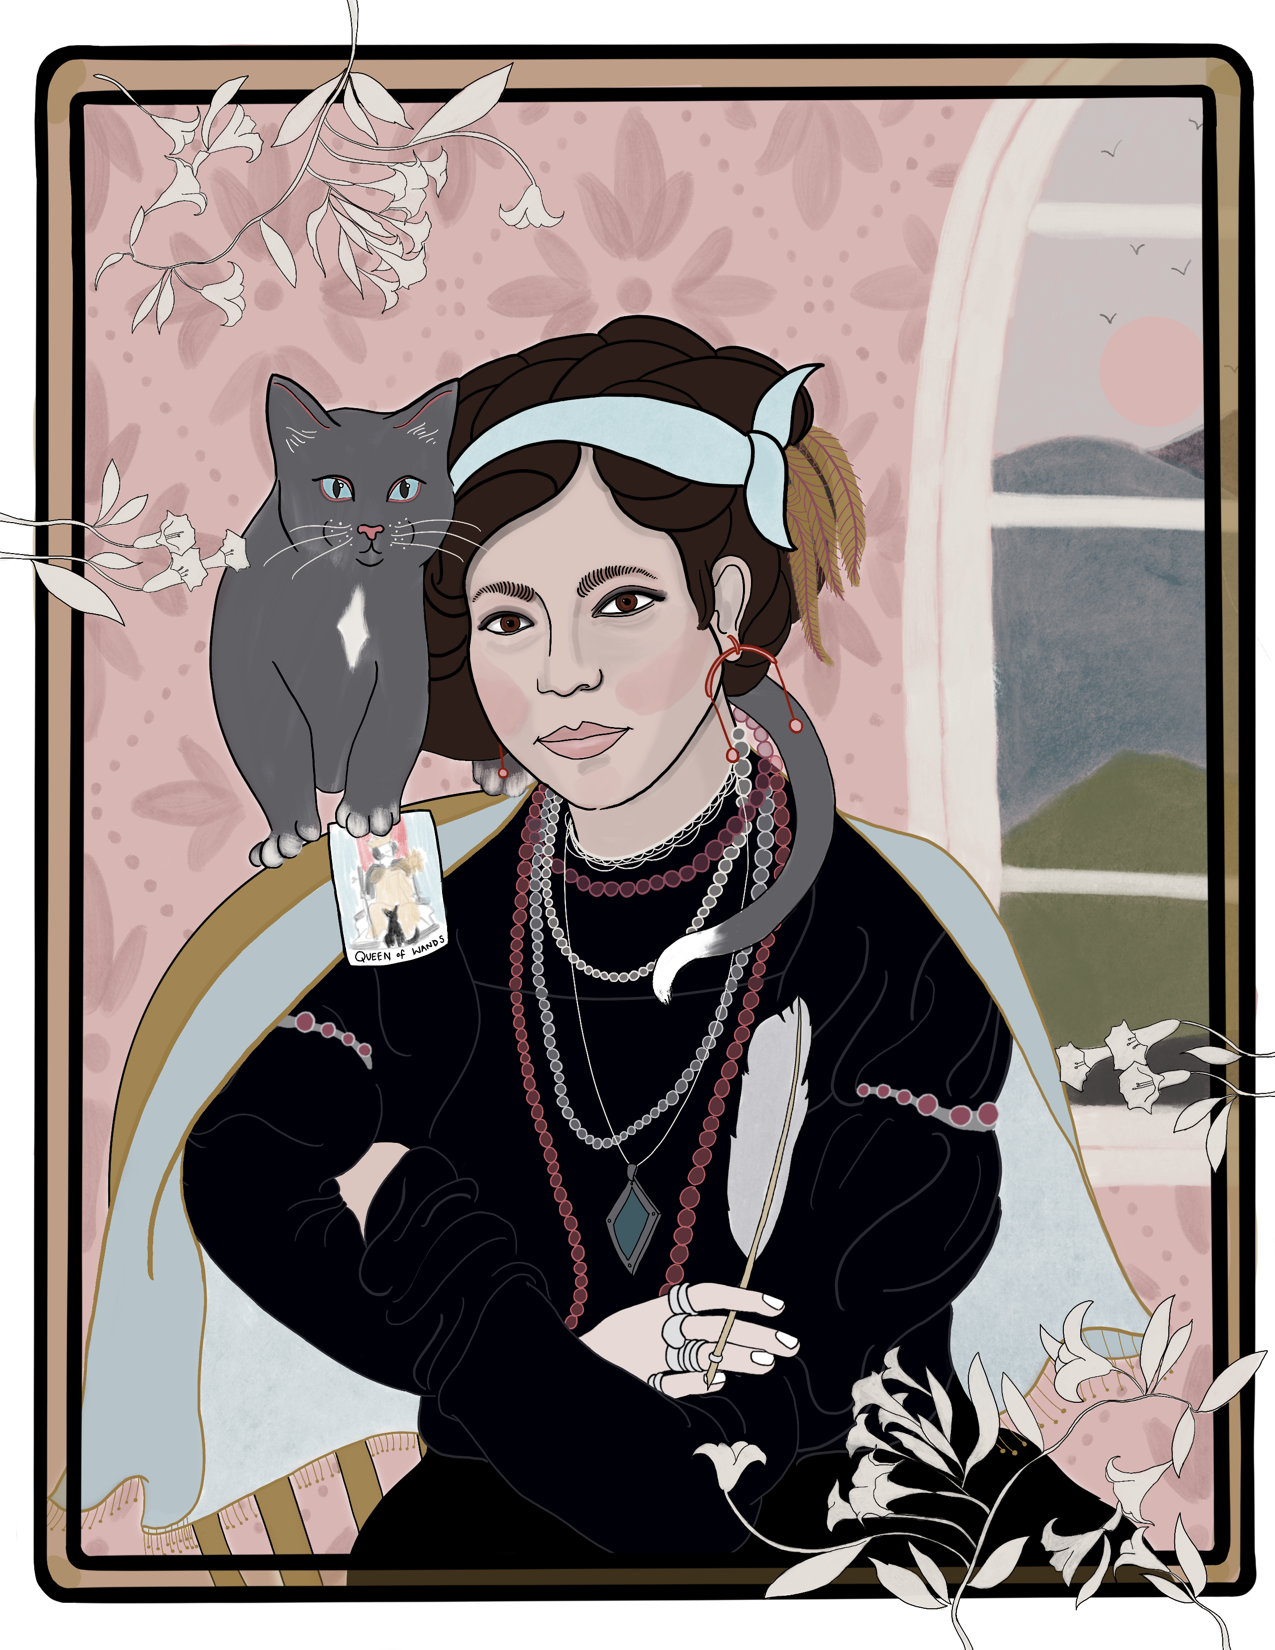 Illustration by Catherine Willett